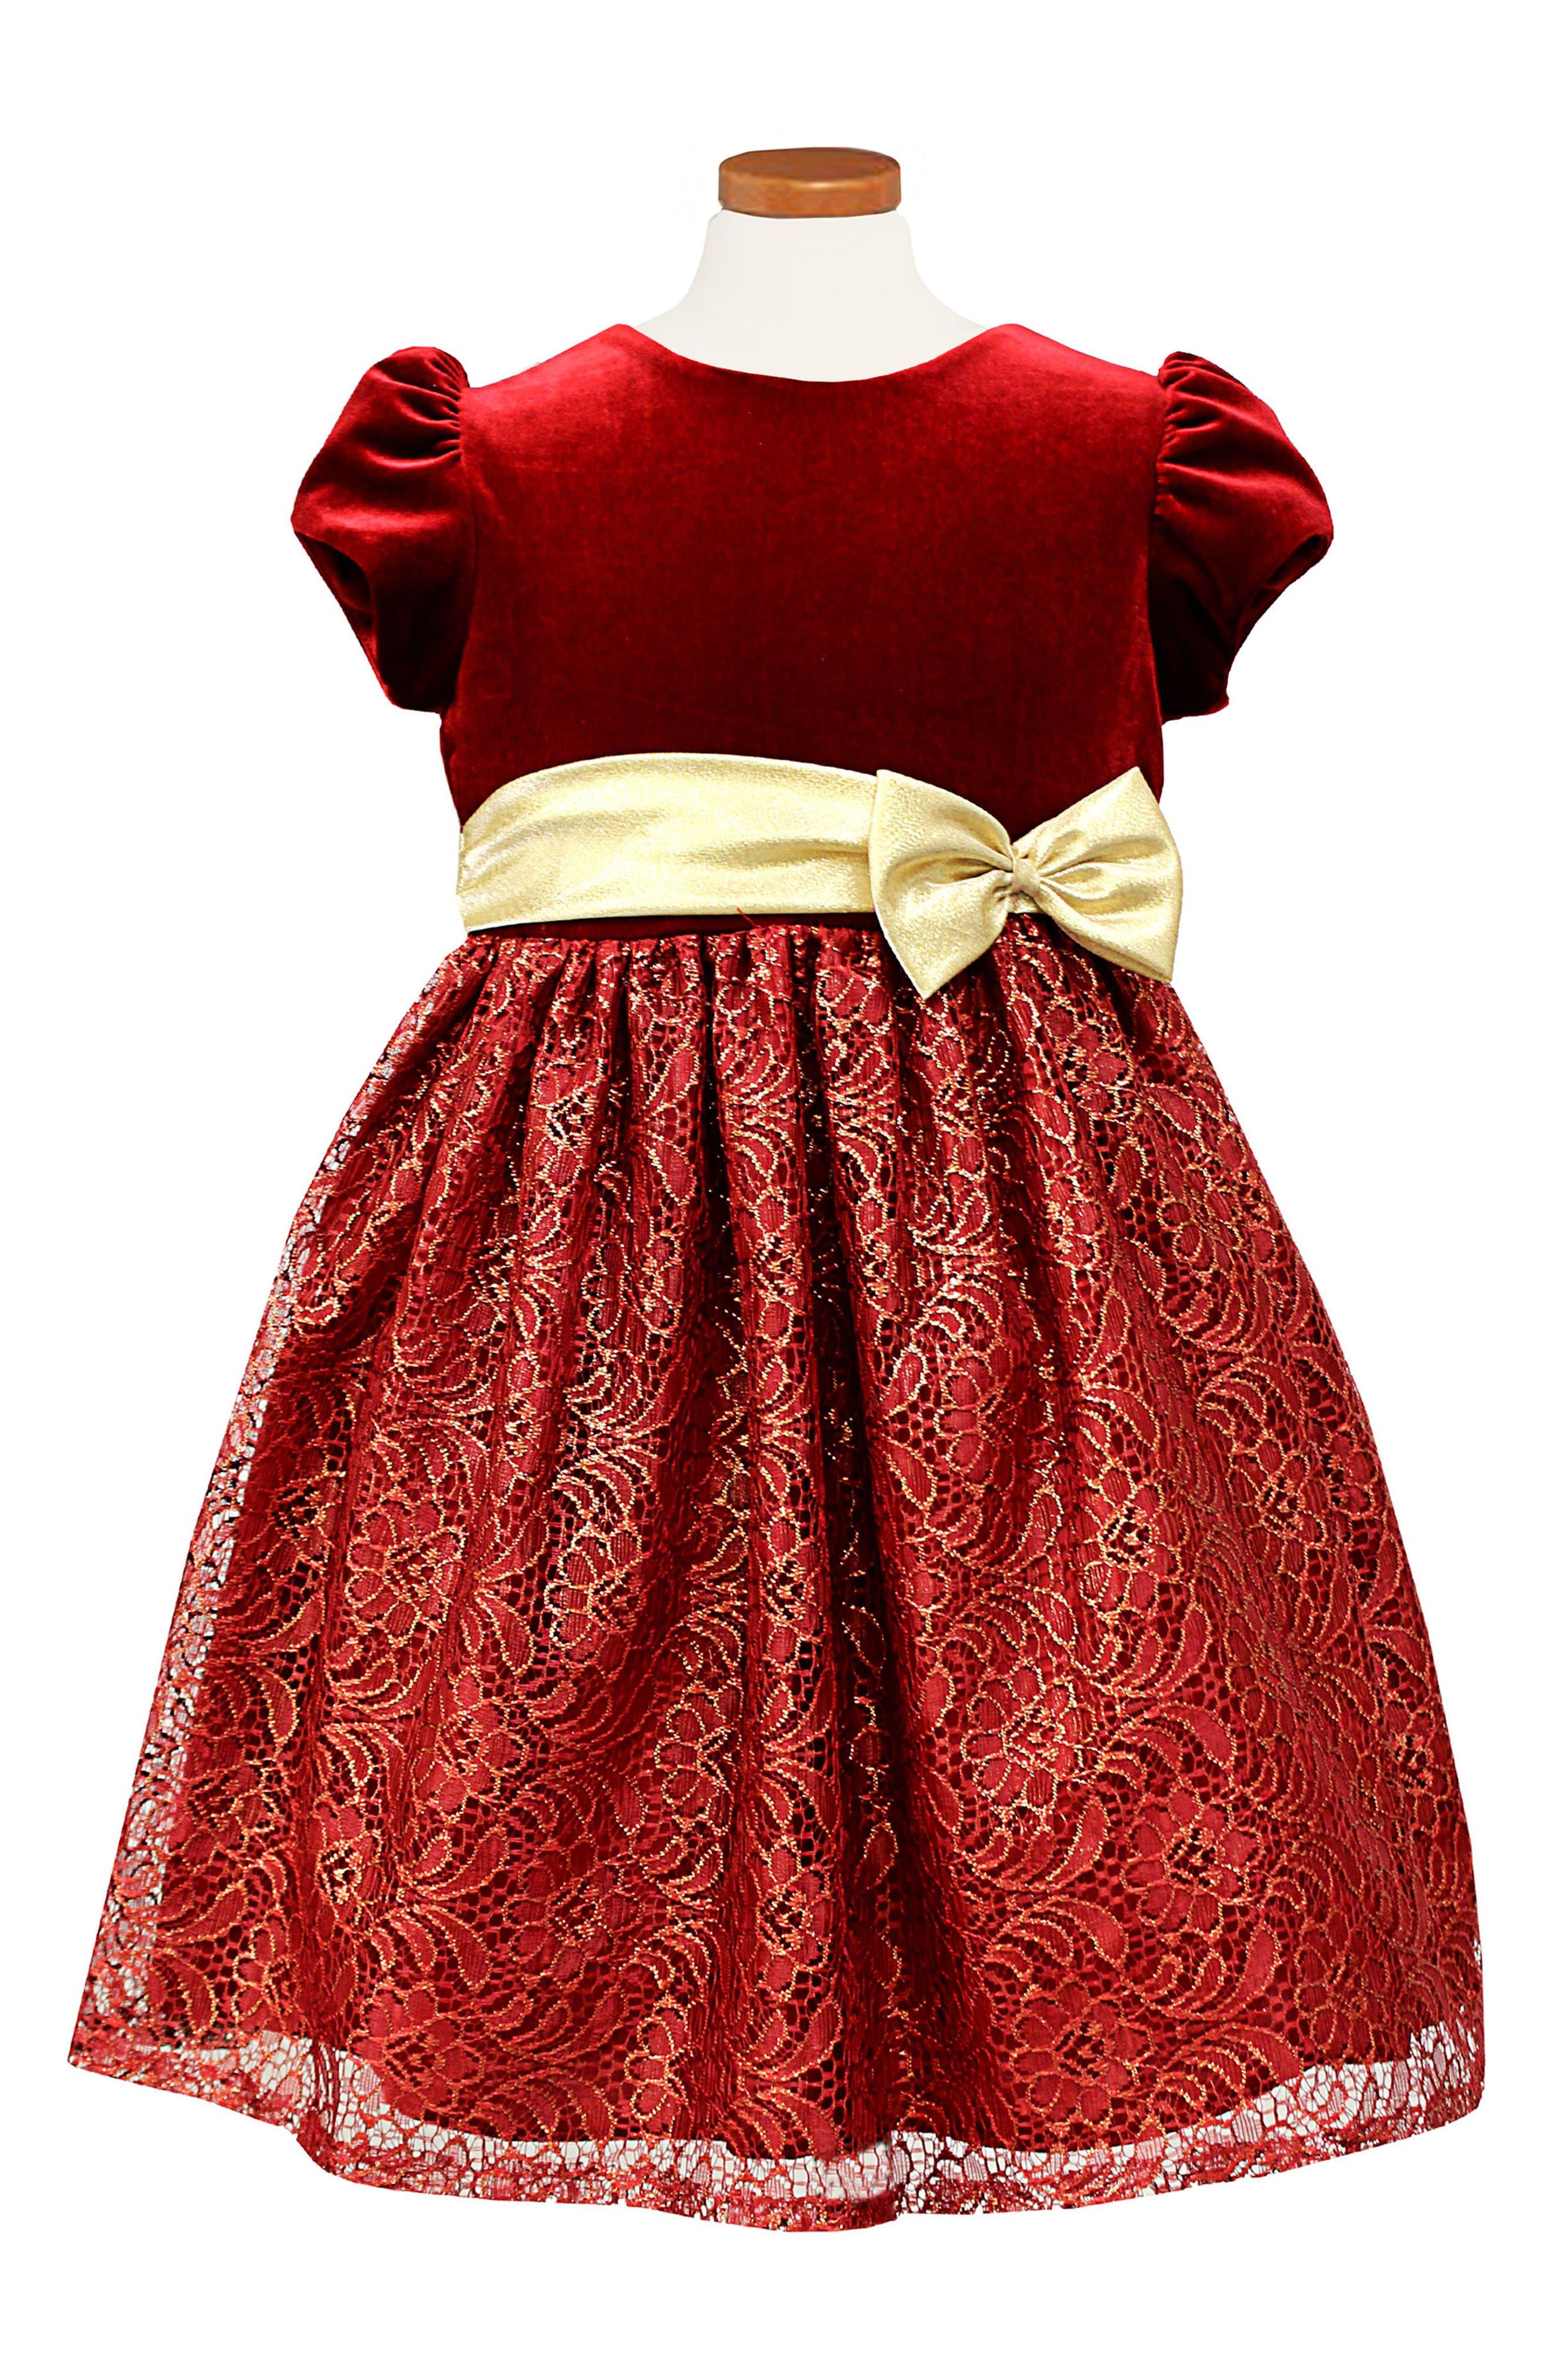 Velvet & Lace Dress,                         Main,                         color, Red